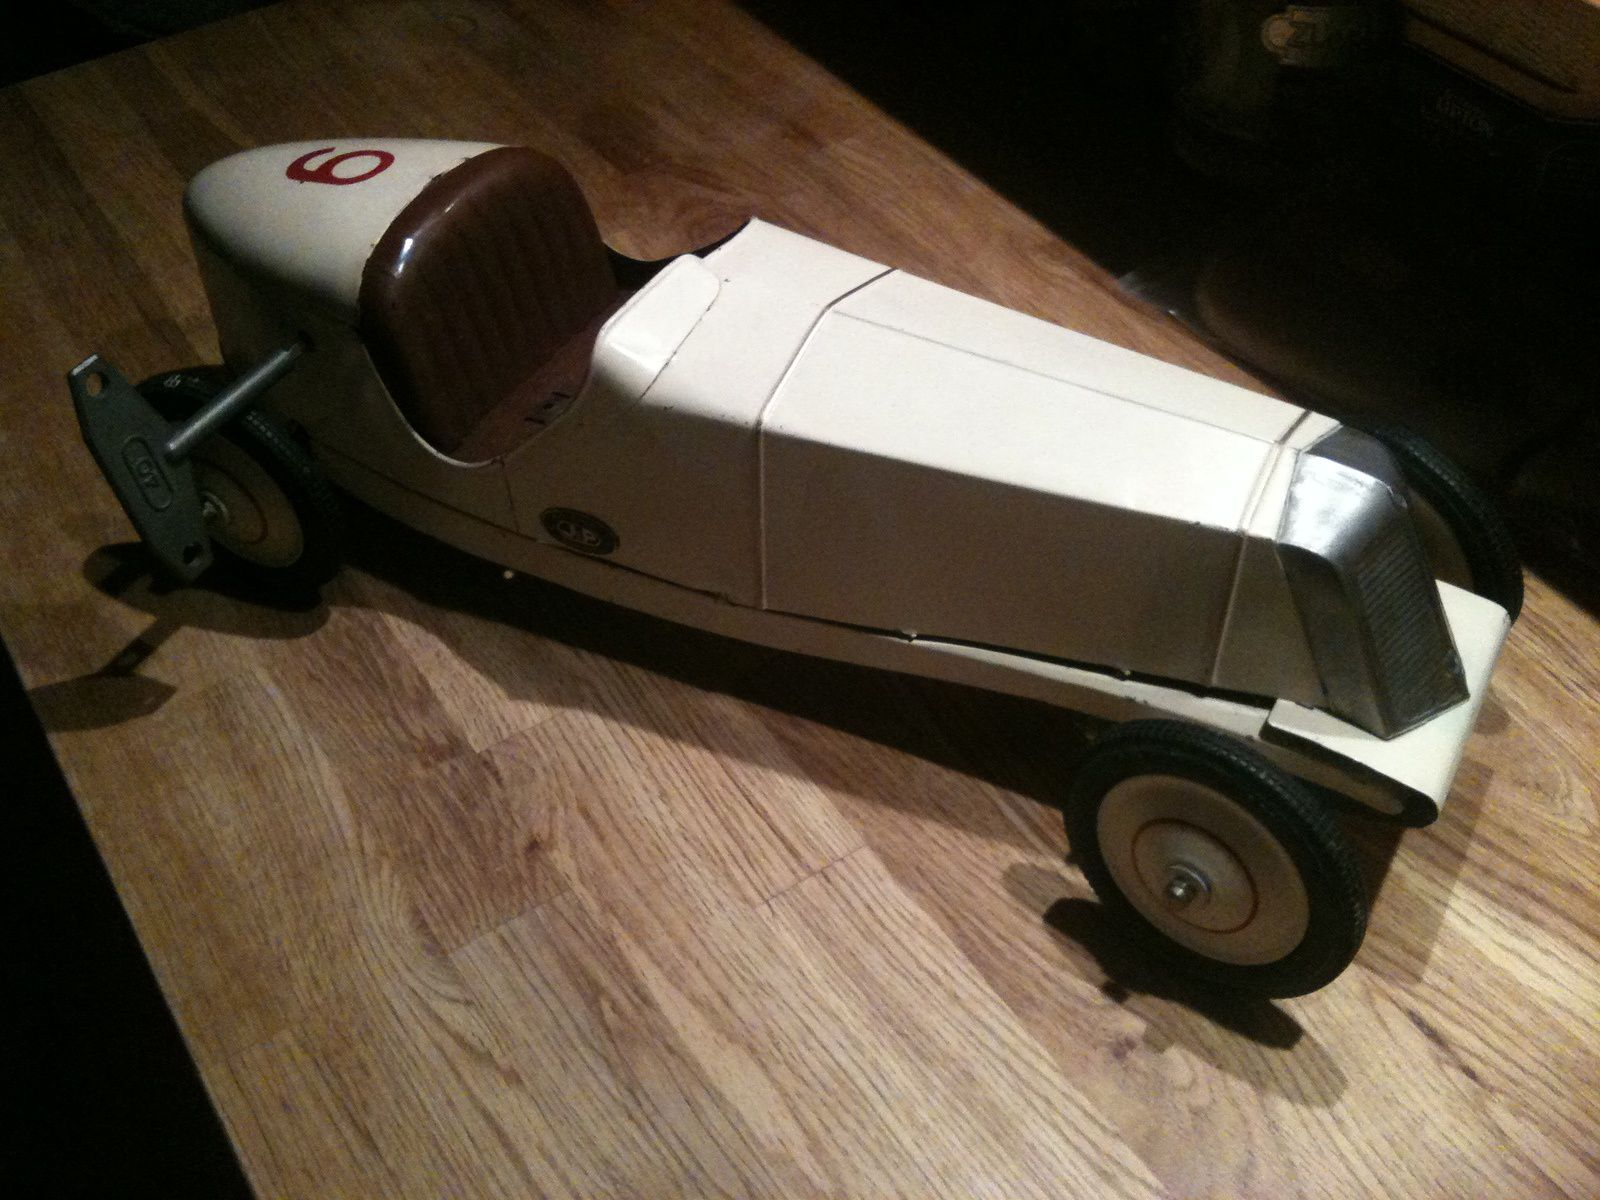 7393 &amp&#x3B; 7394: Grande Delage &amp&#x3B; Renault de course